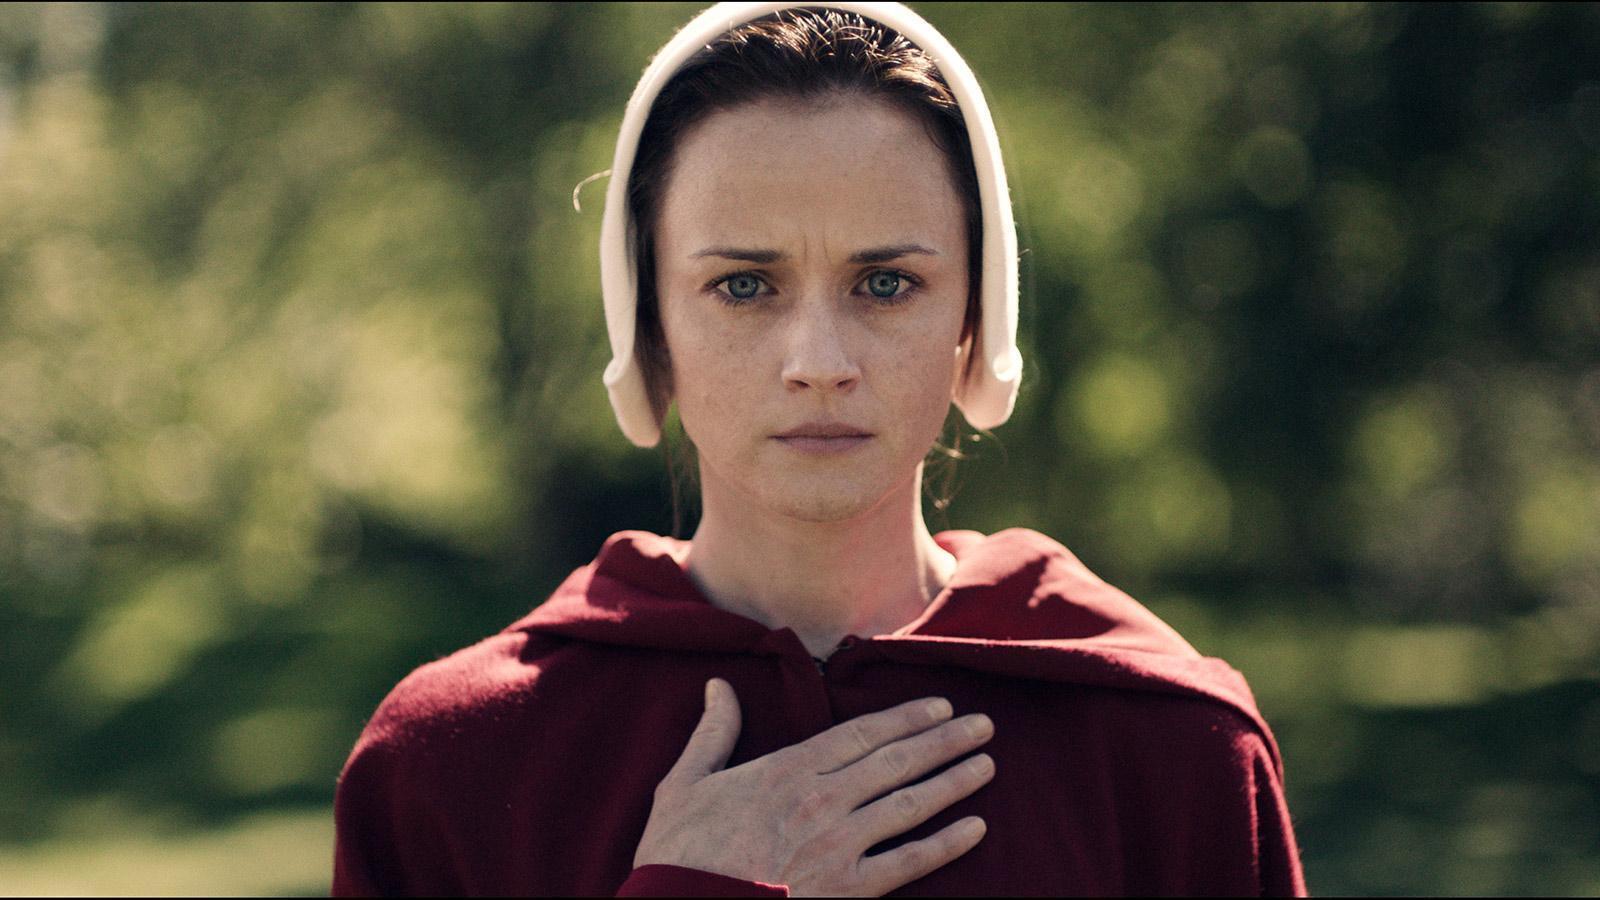 Alexis Bledel - The Handmaid's Tale - serie hbo